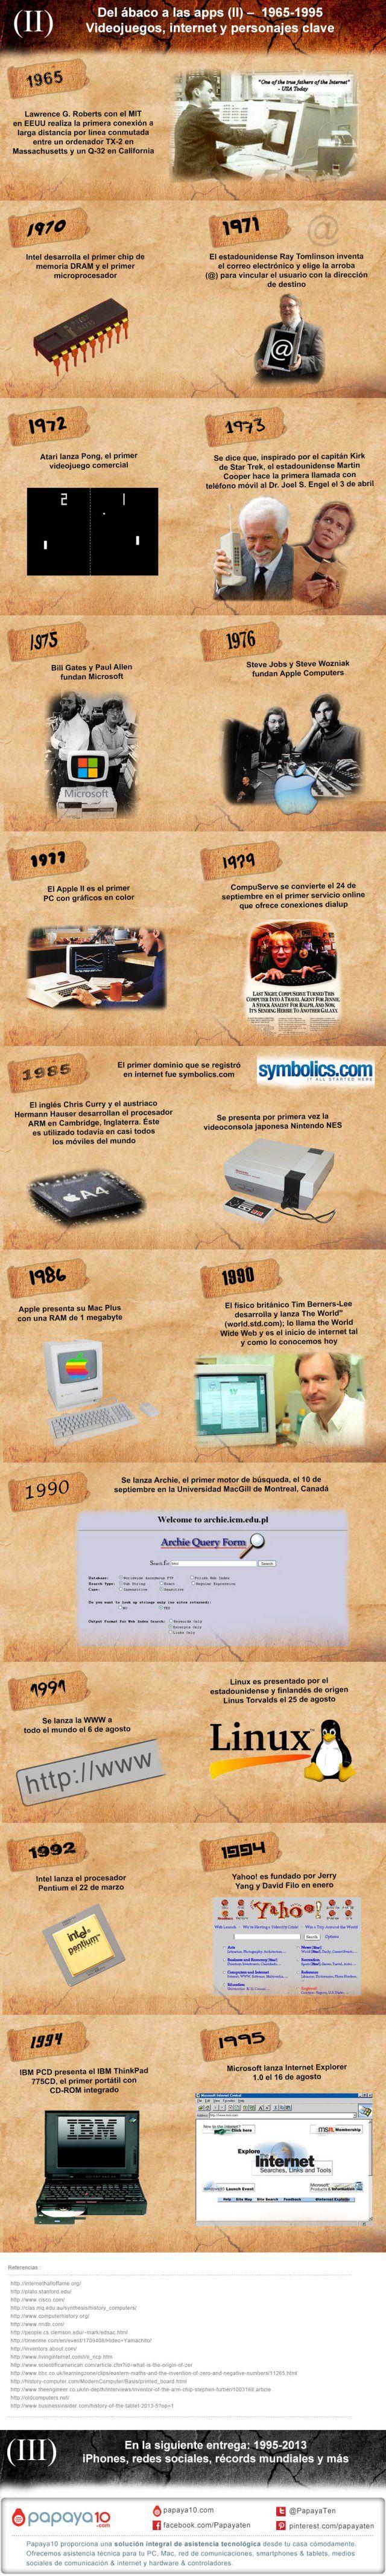 Historia del PC (II): Del 1965 hasta 1995 #informatica #educacion